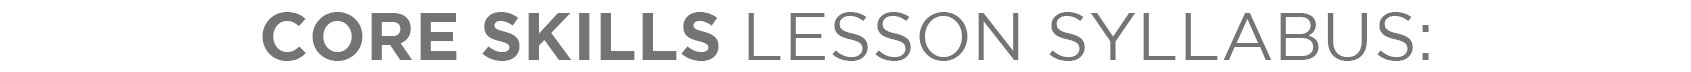 core skills syllabus join neostock elite header